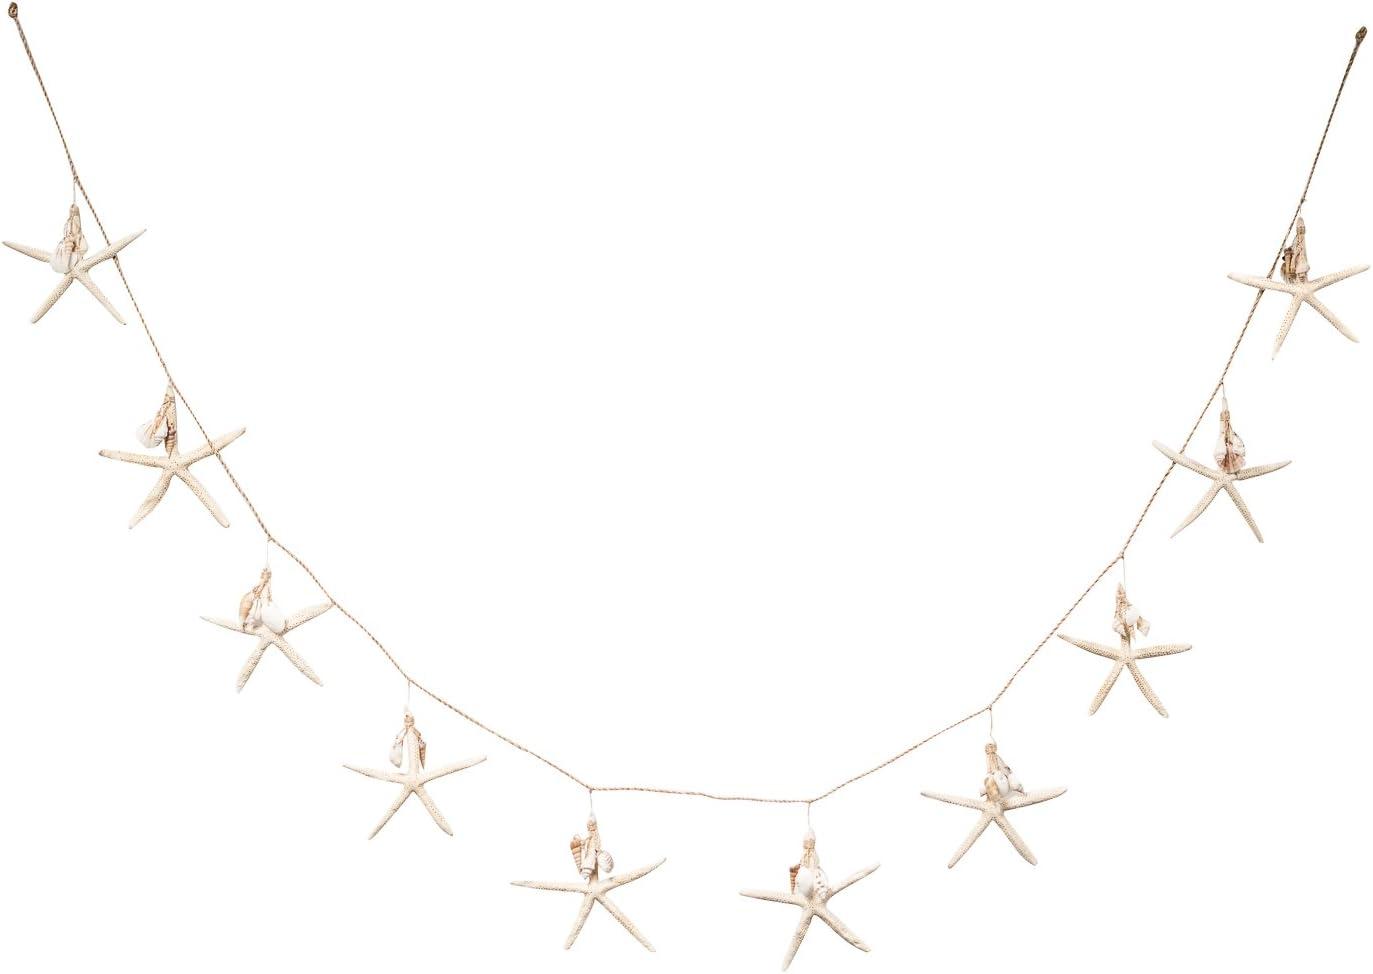 Nautical Garland | White Starfish with Mini Shell Dangles | 6' Beach Garland for Decoration | Plus Free Nautical eBook by Joseph Rains